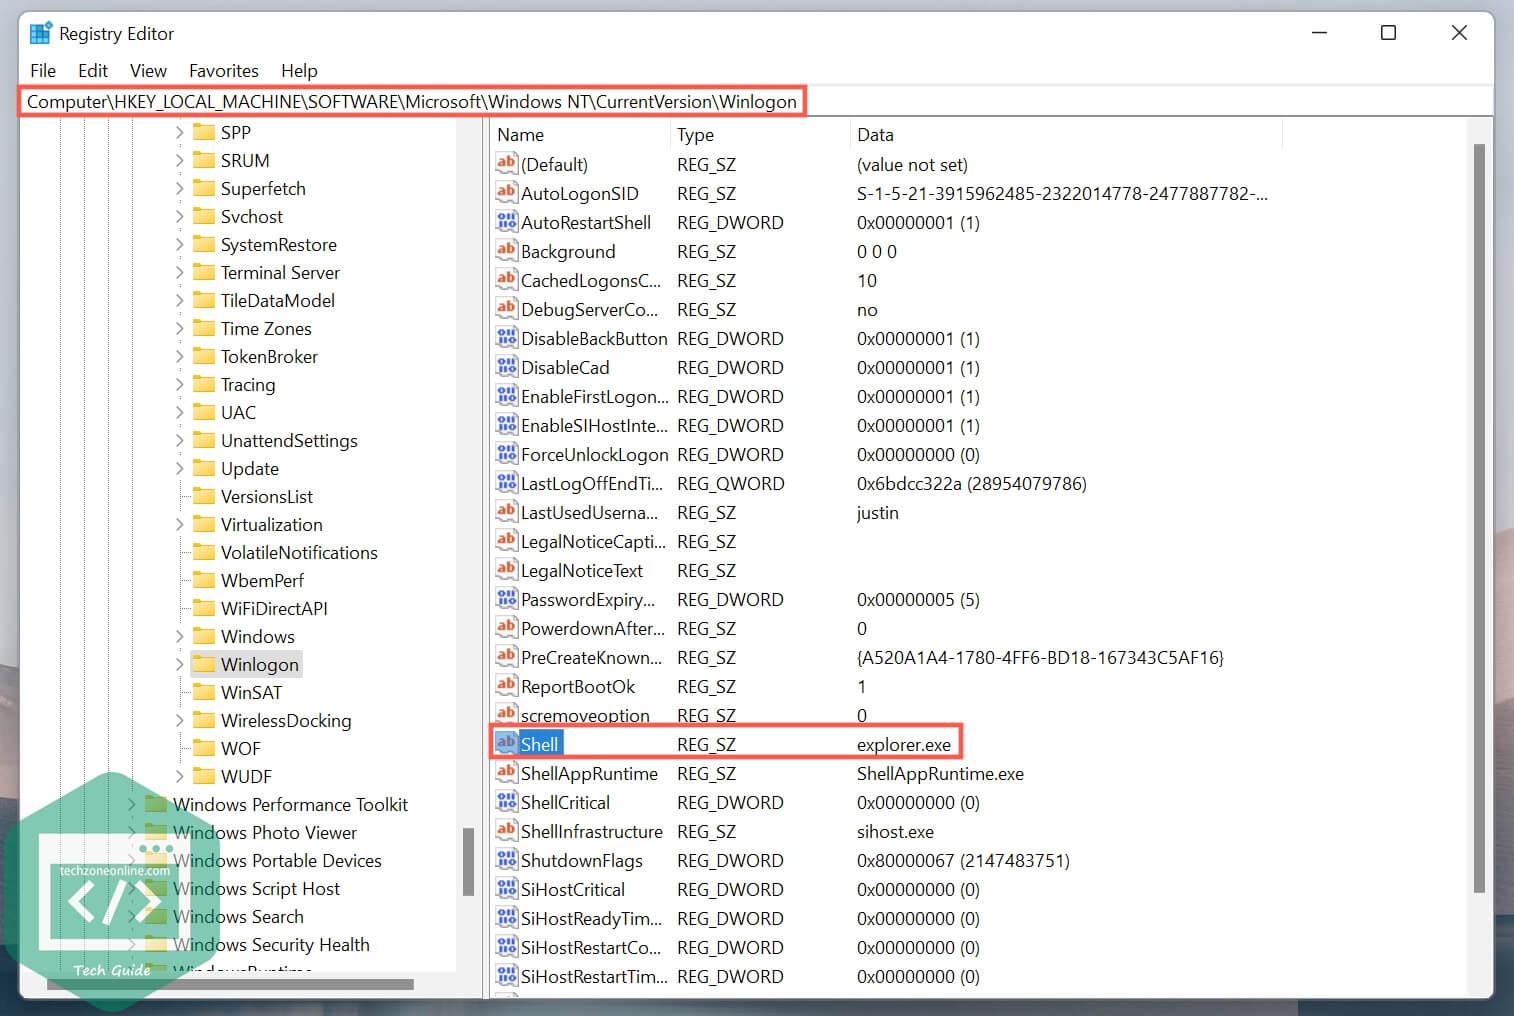 the Shell value in Registry Editor